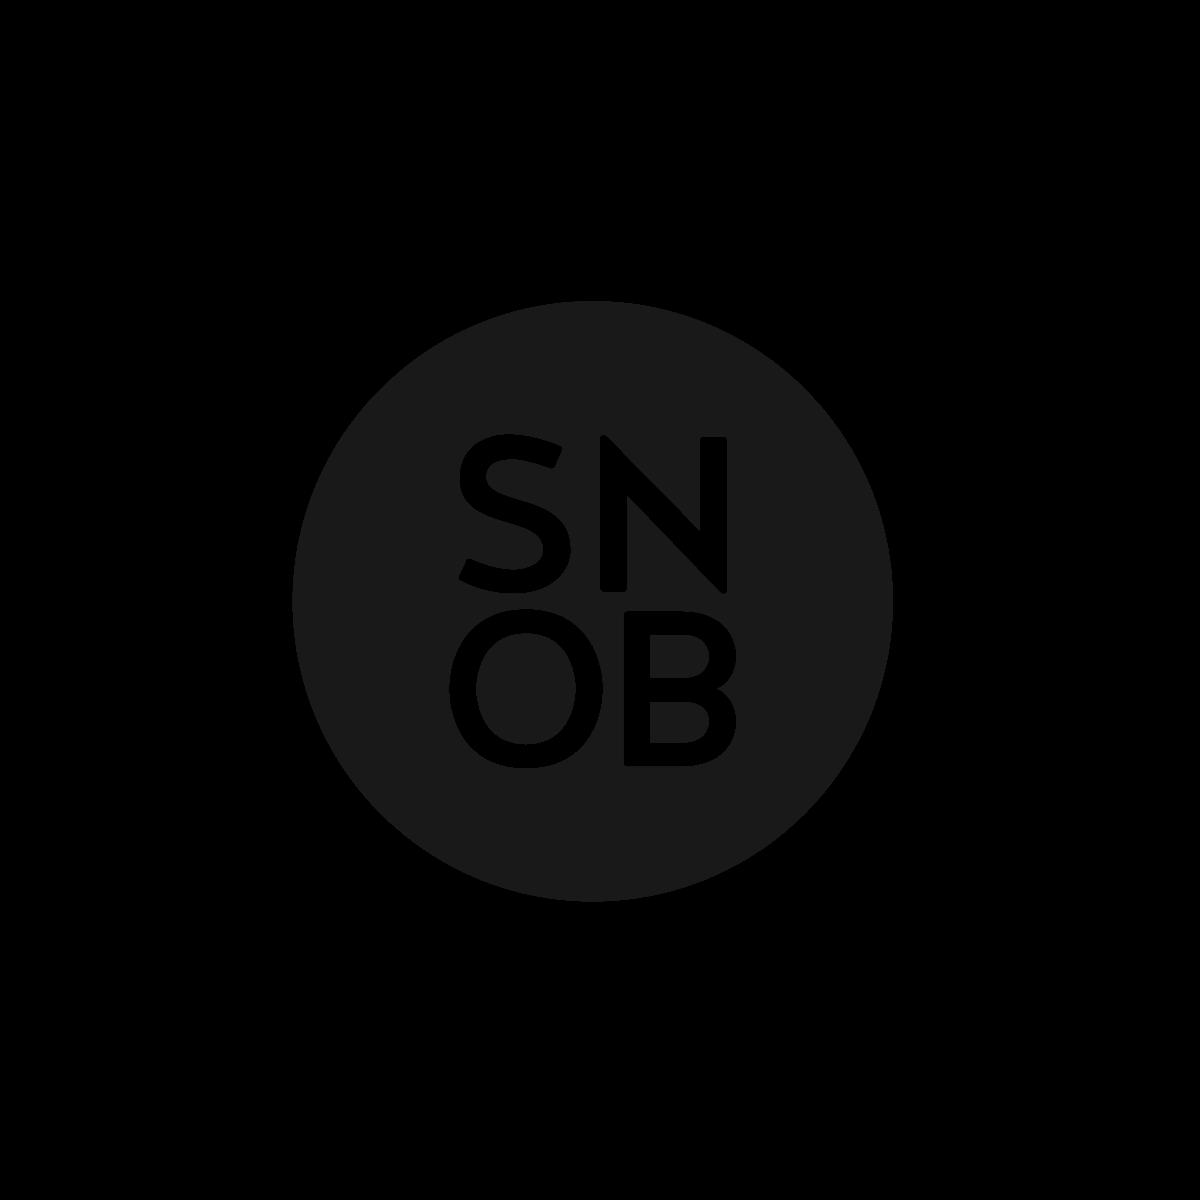 Design a logo for my new marketing agency